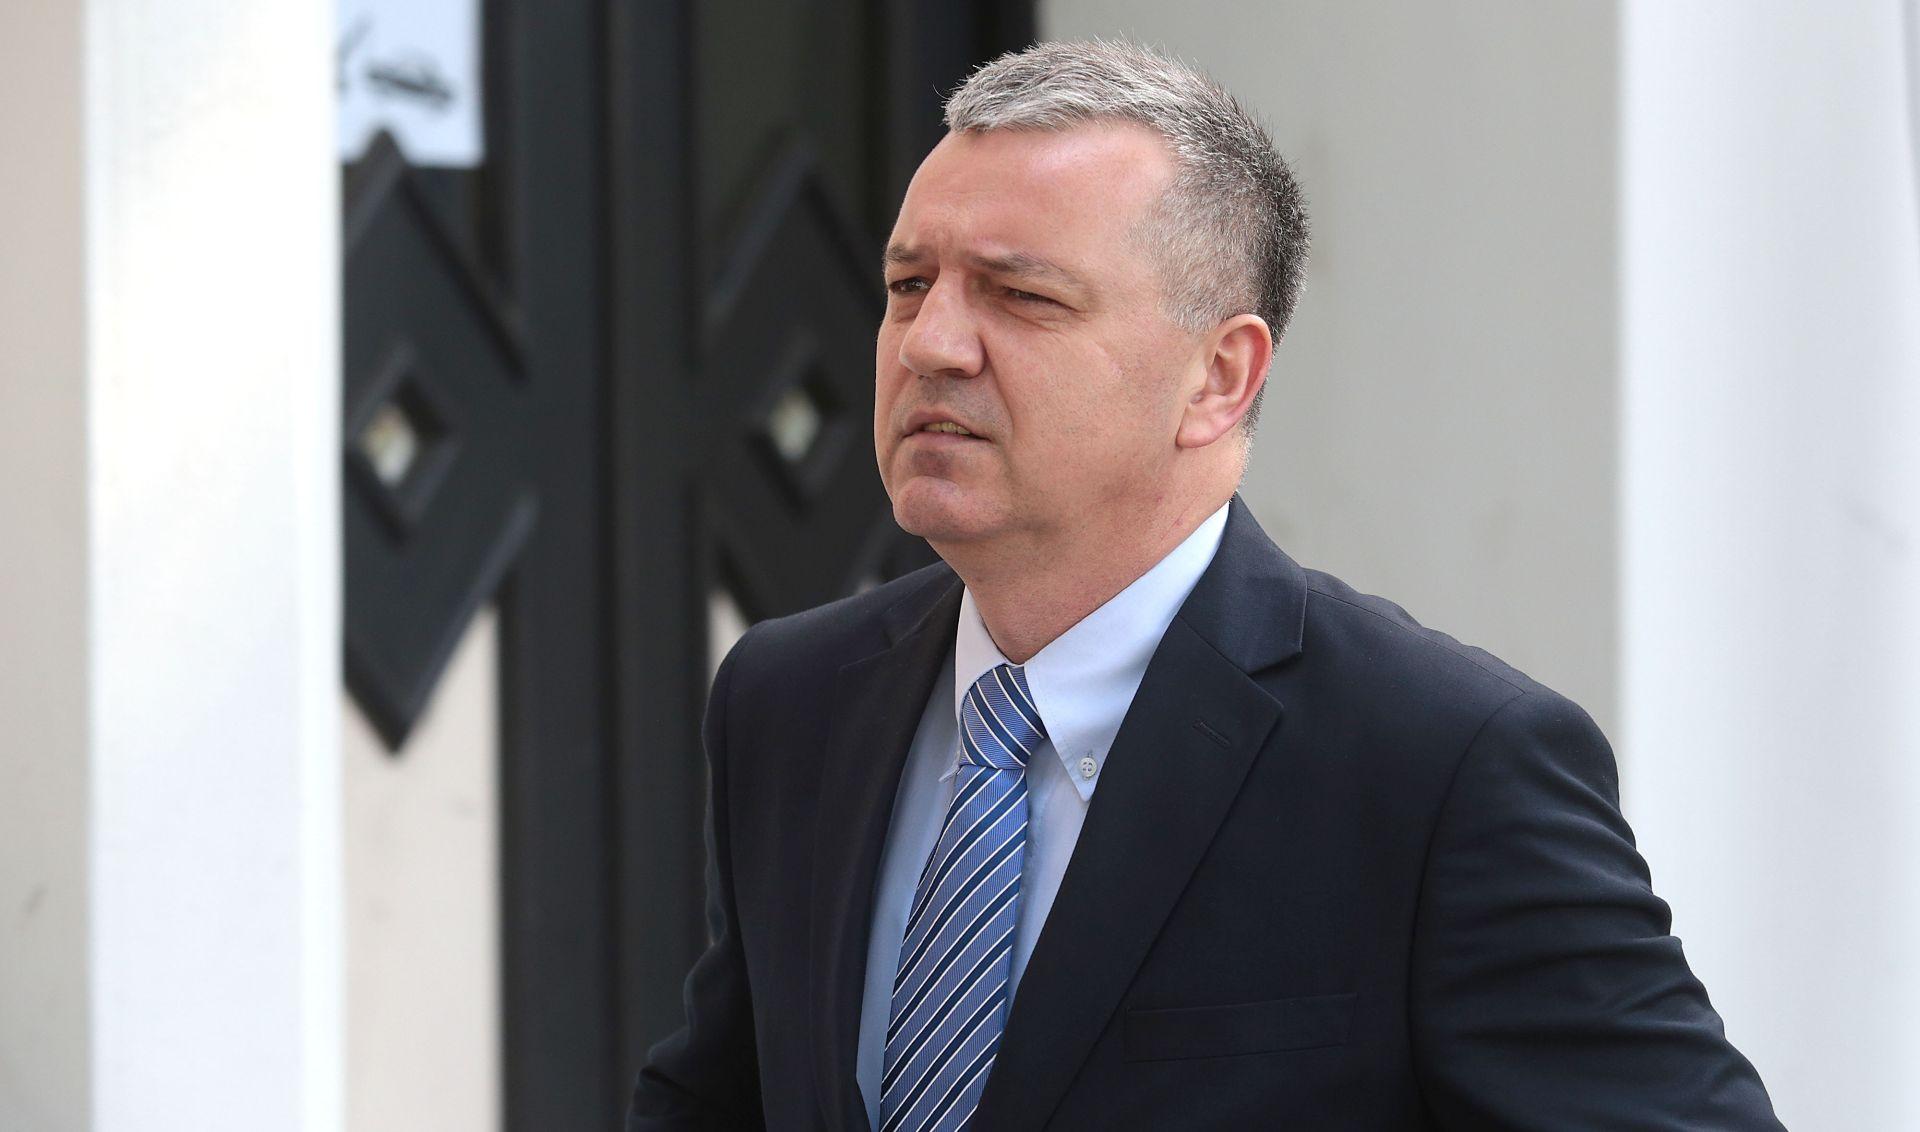 Darko Horvat provocira Plenkovića